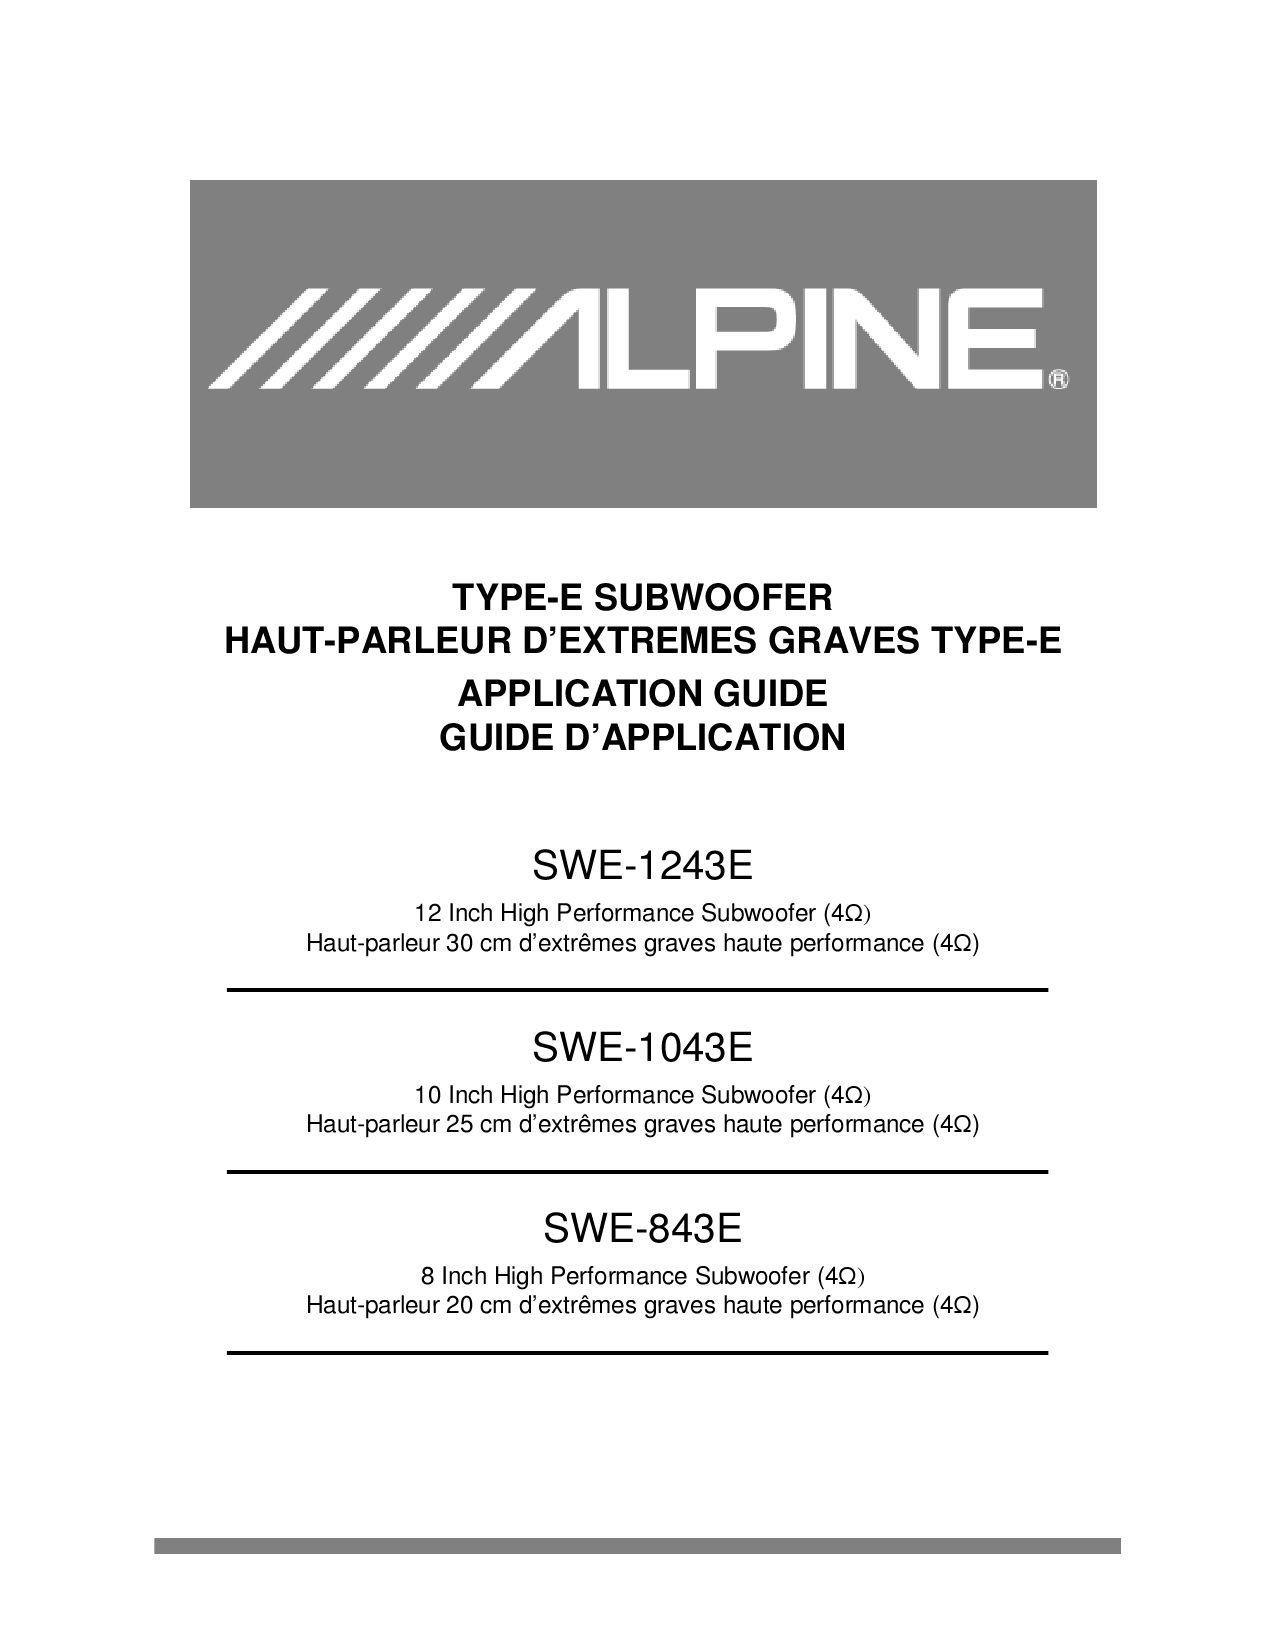 Type De Haut Parleur alpine swe843e/swe1043e/swe1243e manualtalk audio online